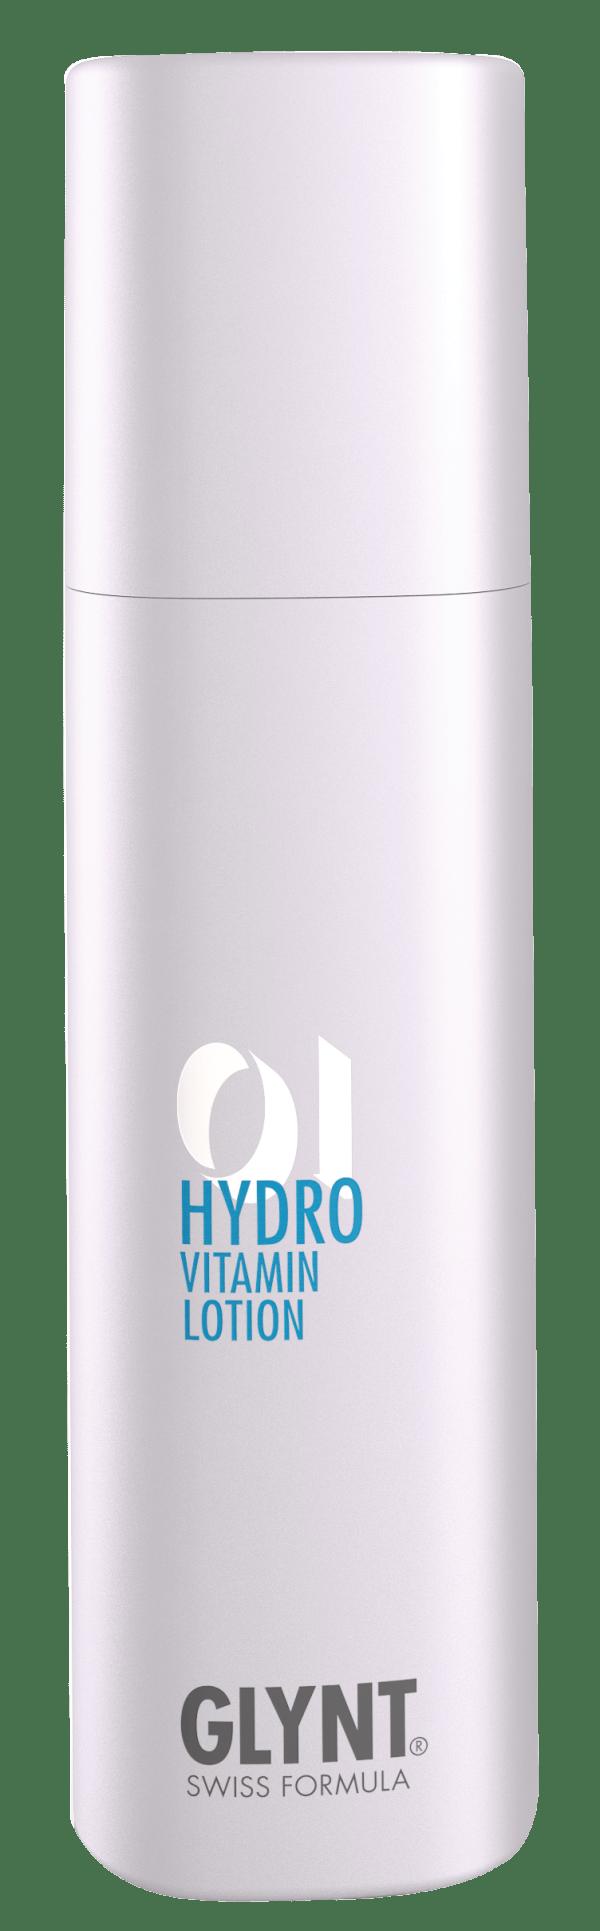 Glynt Hydro Vitamin Lotion